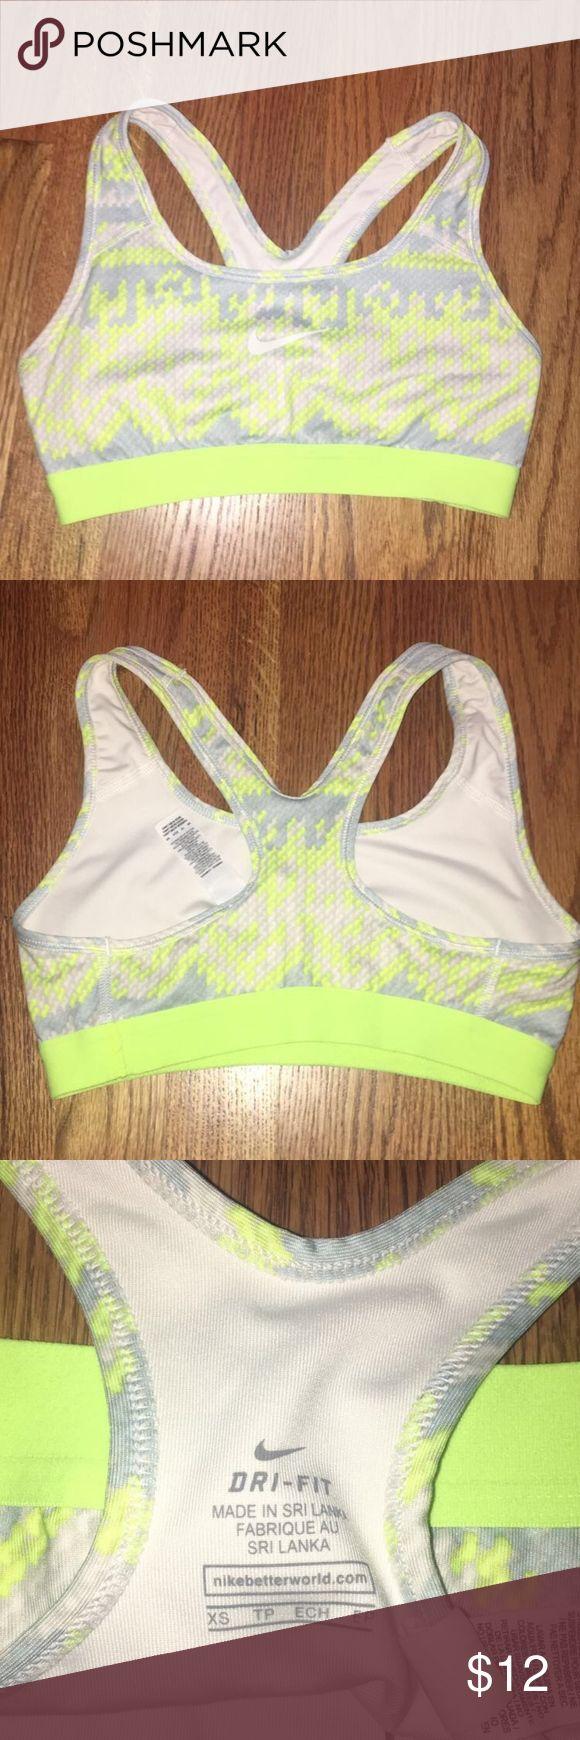 Nike Sports Bra Size XS Nike Yellow, white, and grey aztec print sports bra (In great condition) Nike Intimates & Sleepwear Bras